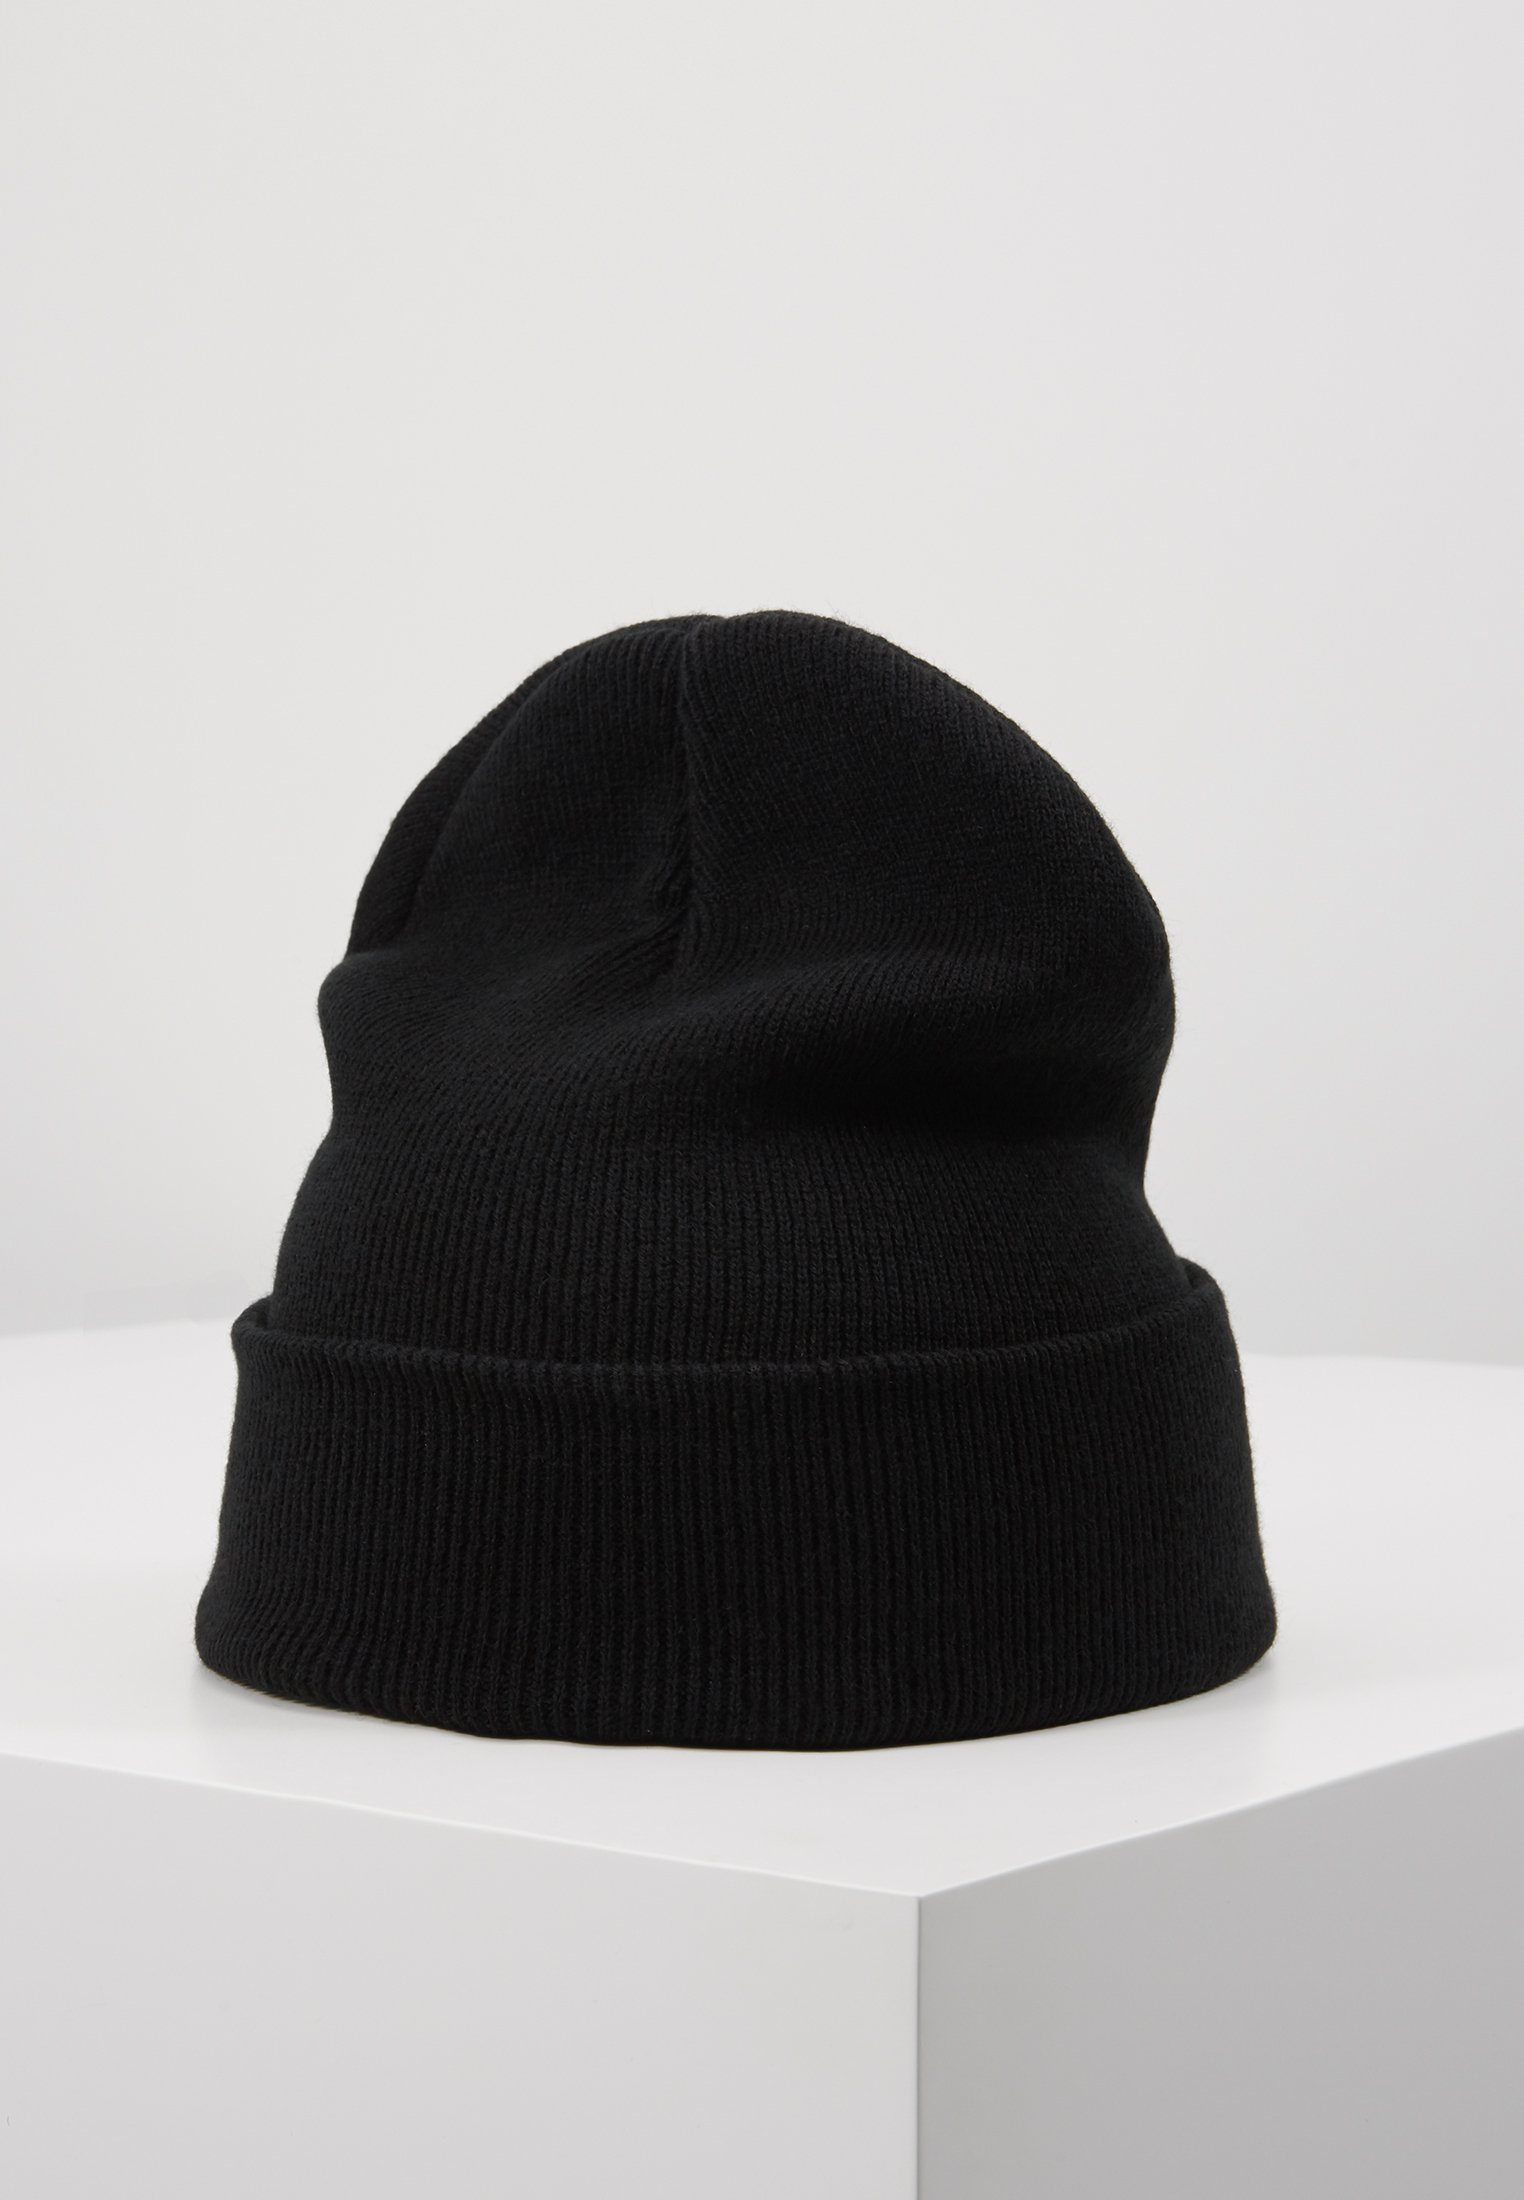 Fiorucci BEANIE WITH EMBROIDERED LOGO - Lue - black/svart rVk18lhC8E5nqzC